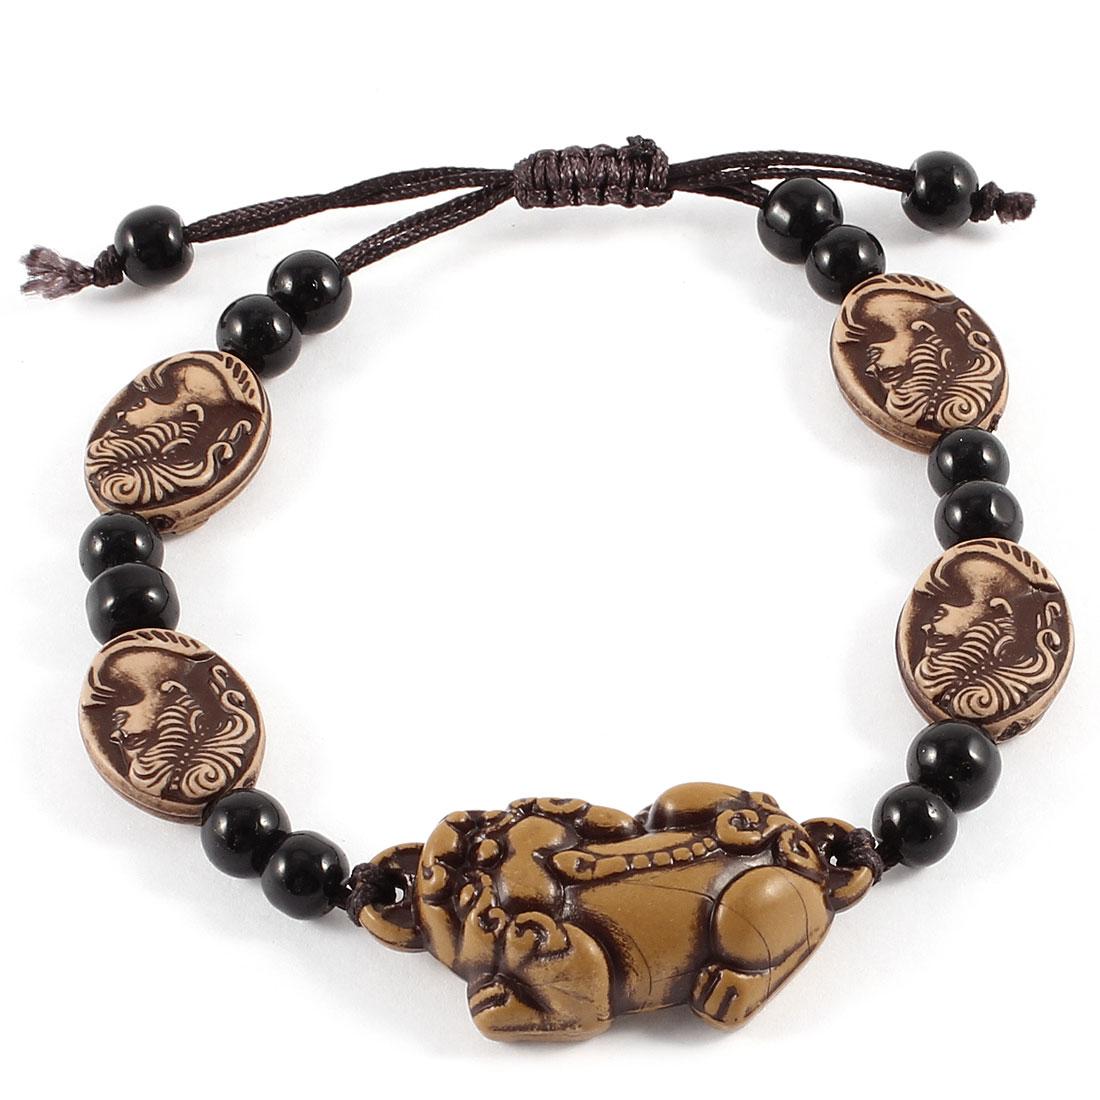 Black Plastic Beads Linked Hikyuu Decor Adjustable Rope Bangle Bracelet